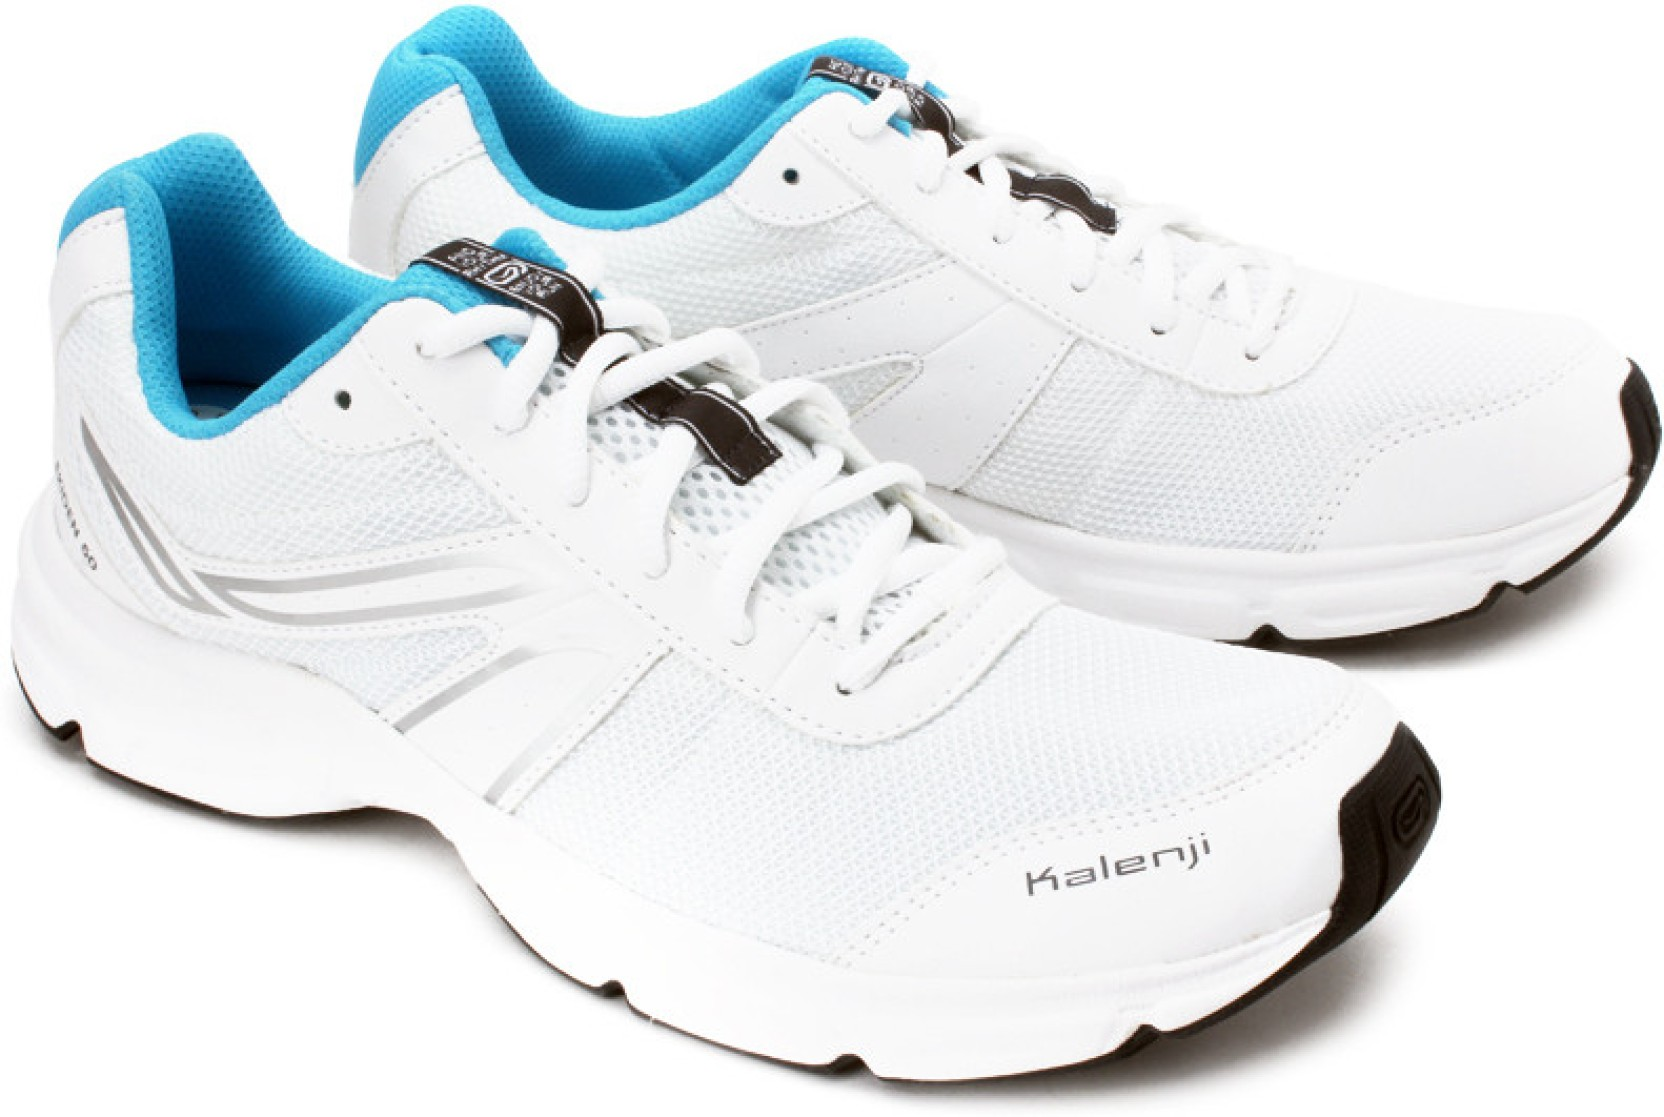 Kalenji Shoes Online